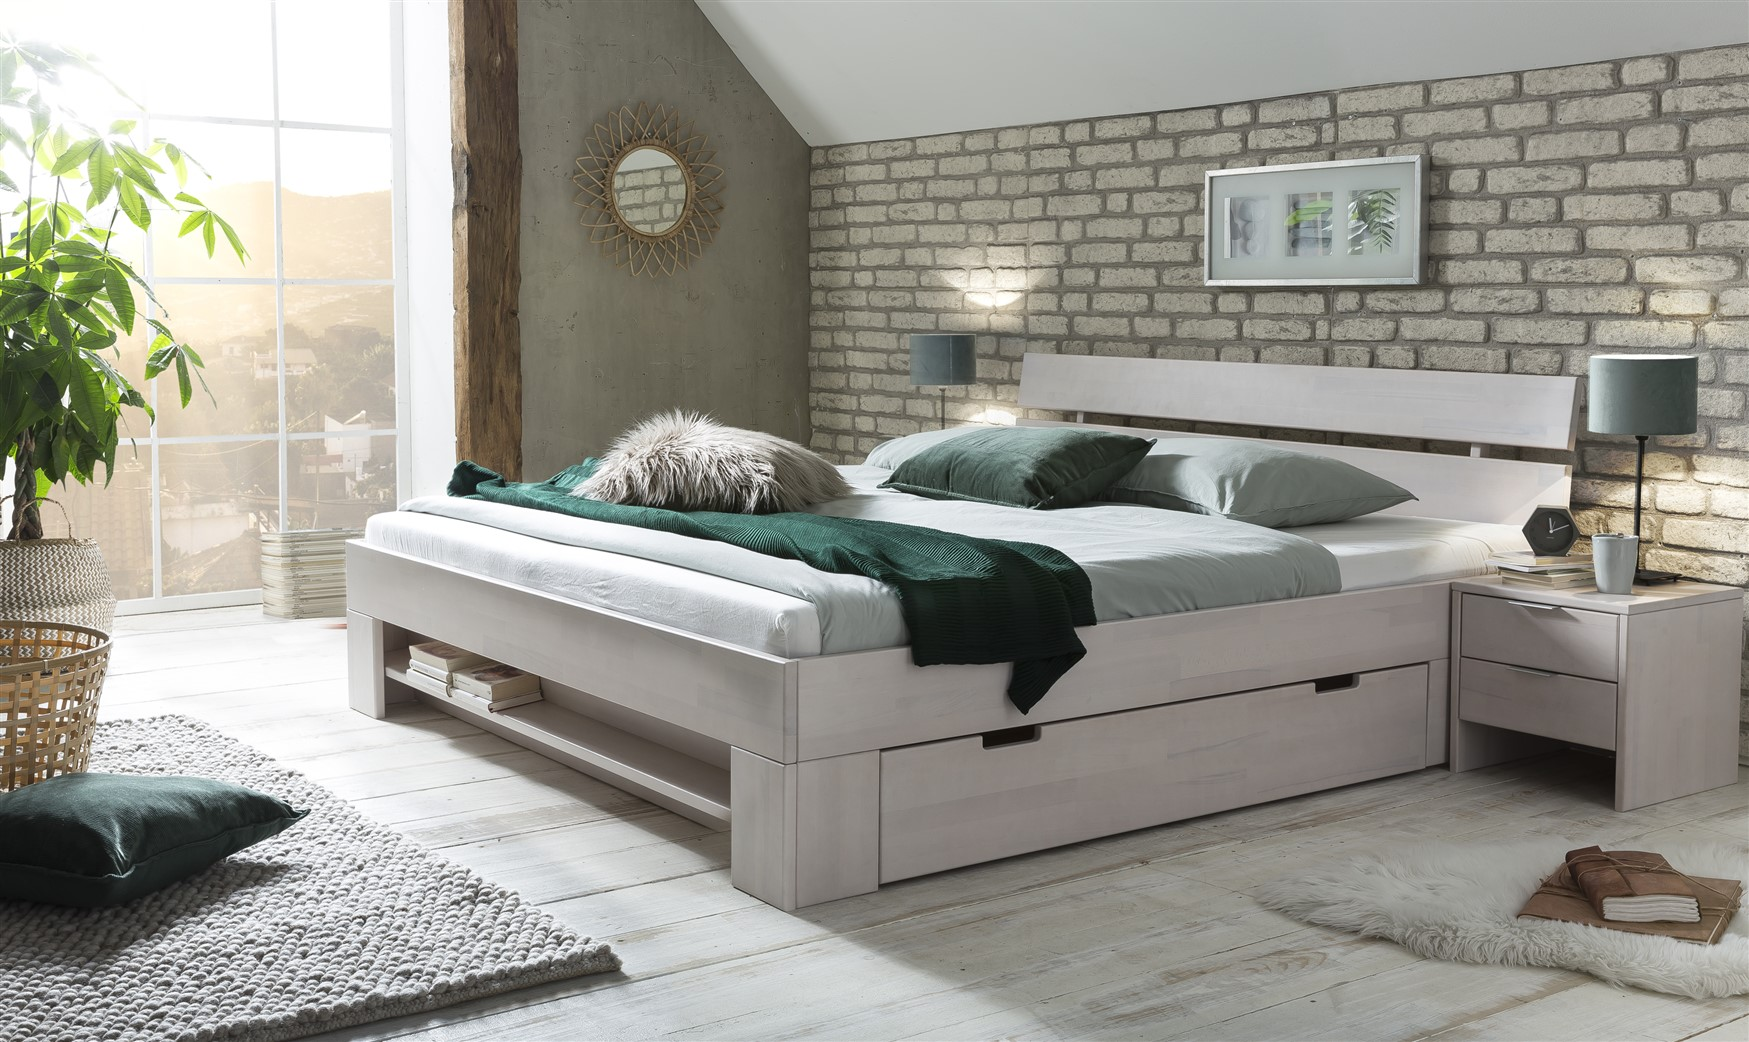 Holzbett Bett Doppelbett weiß Set Nachttisch Bettkasten Matratze Kiefer lackiert